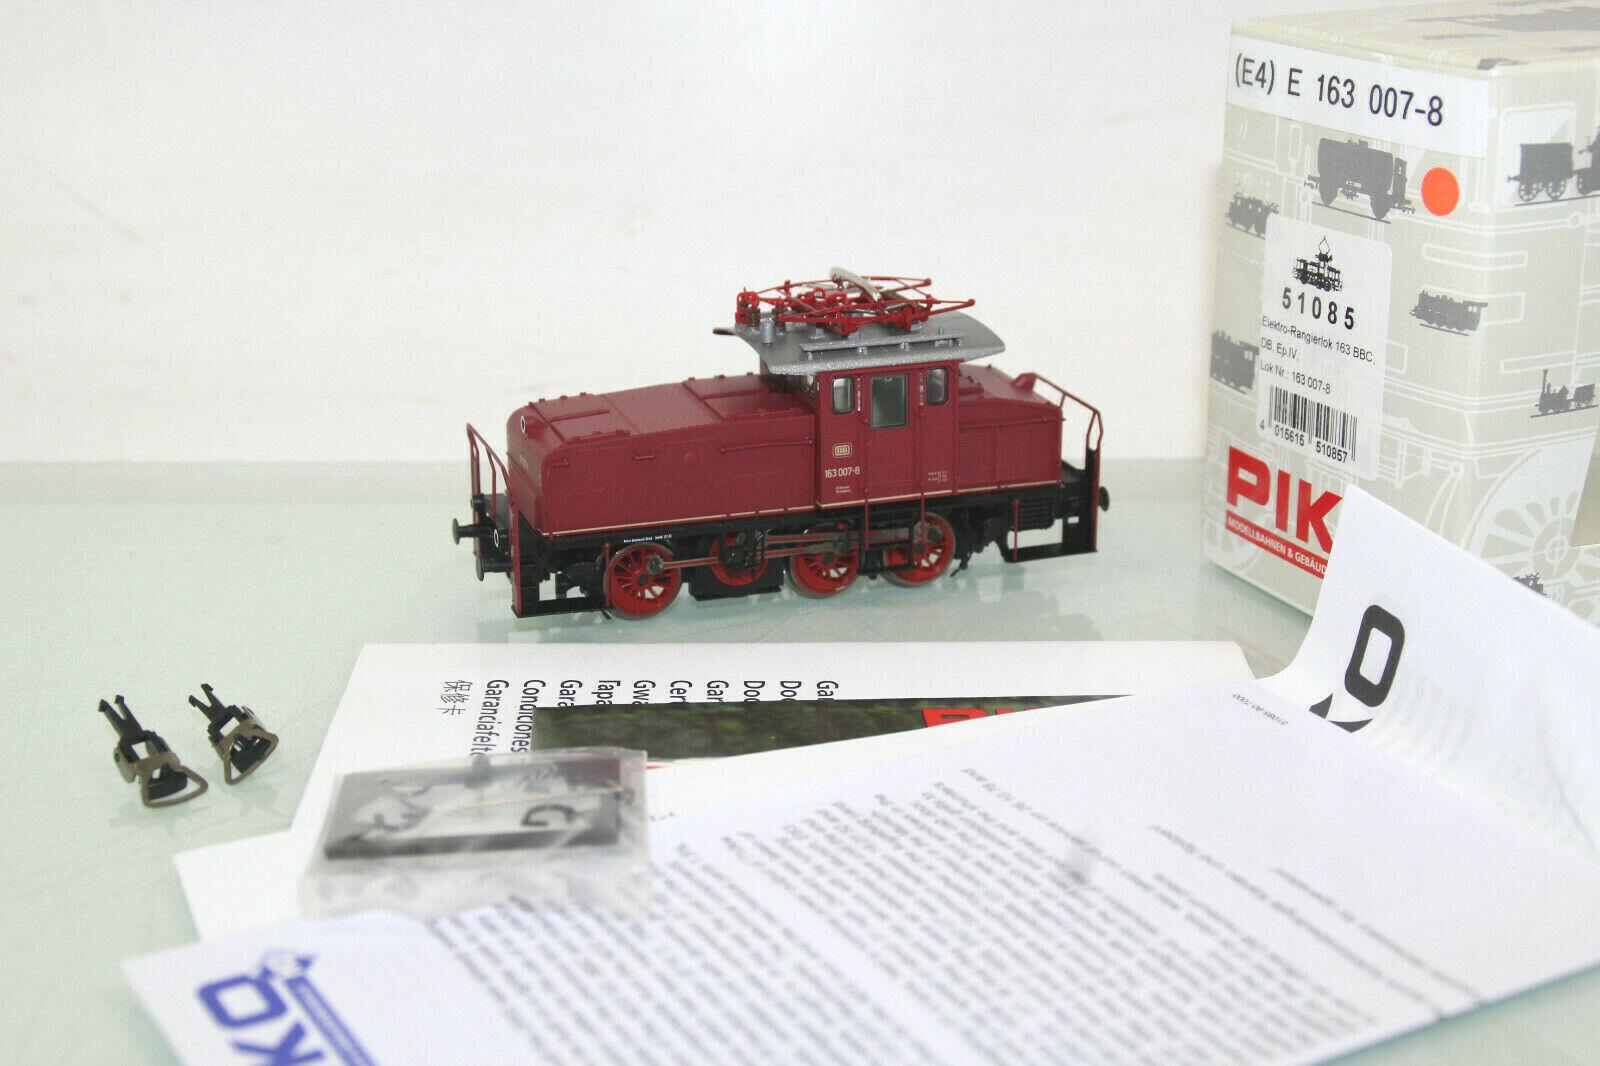 Picoch H0 51085 e - rangierlok BR 163 007 - 8 BBC der DB neuwertig in ovp (cl4833)